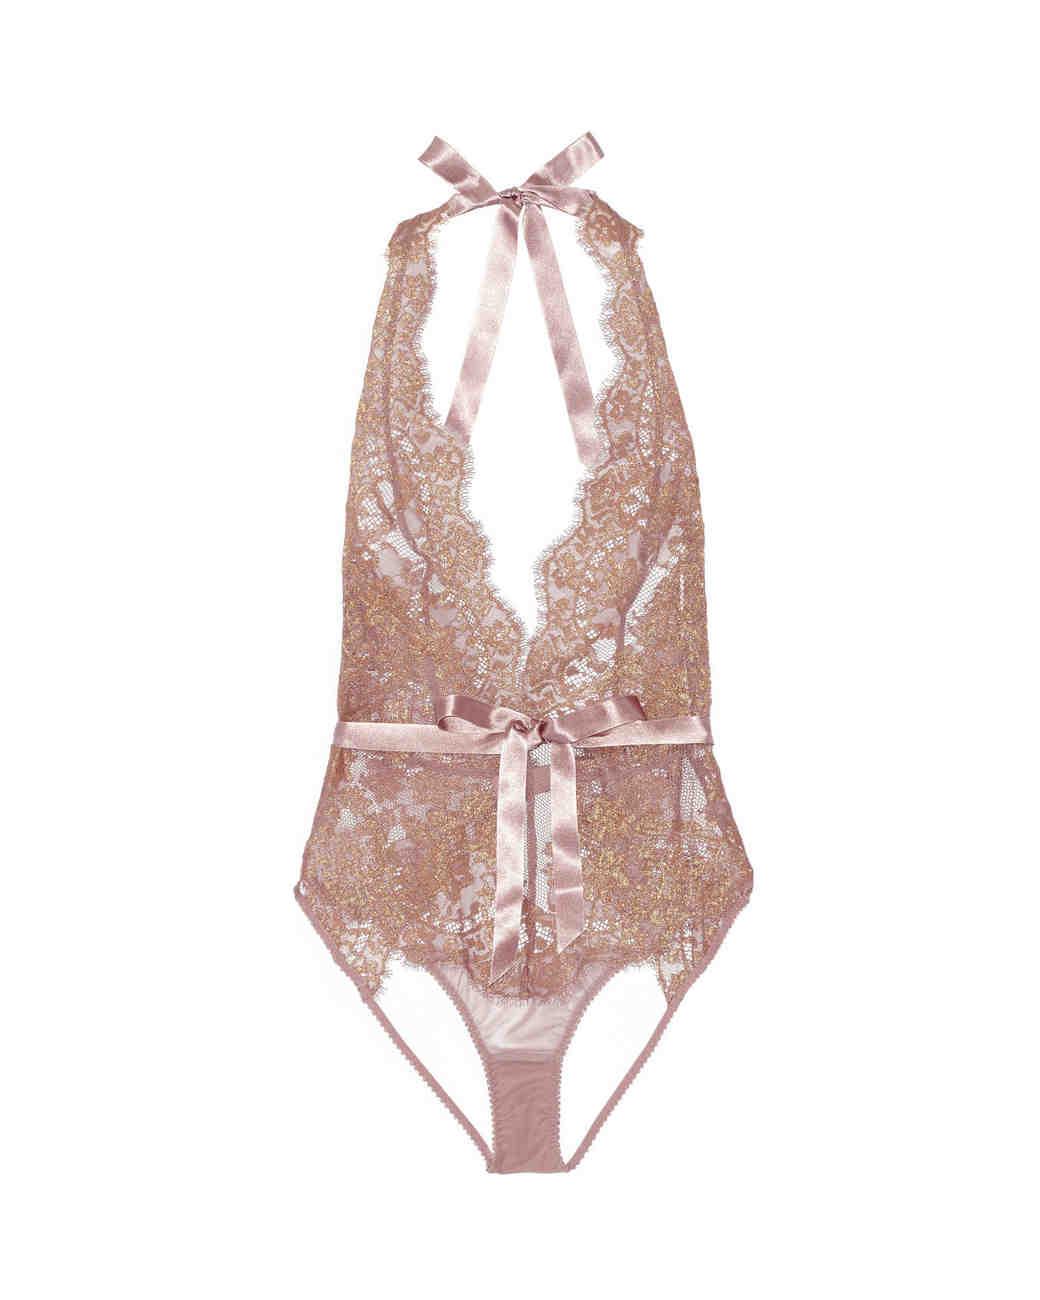 group-bachelorette-party-gifts-lagent-lingerie-0316.jpg